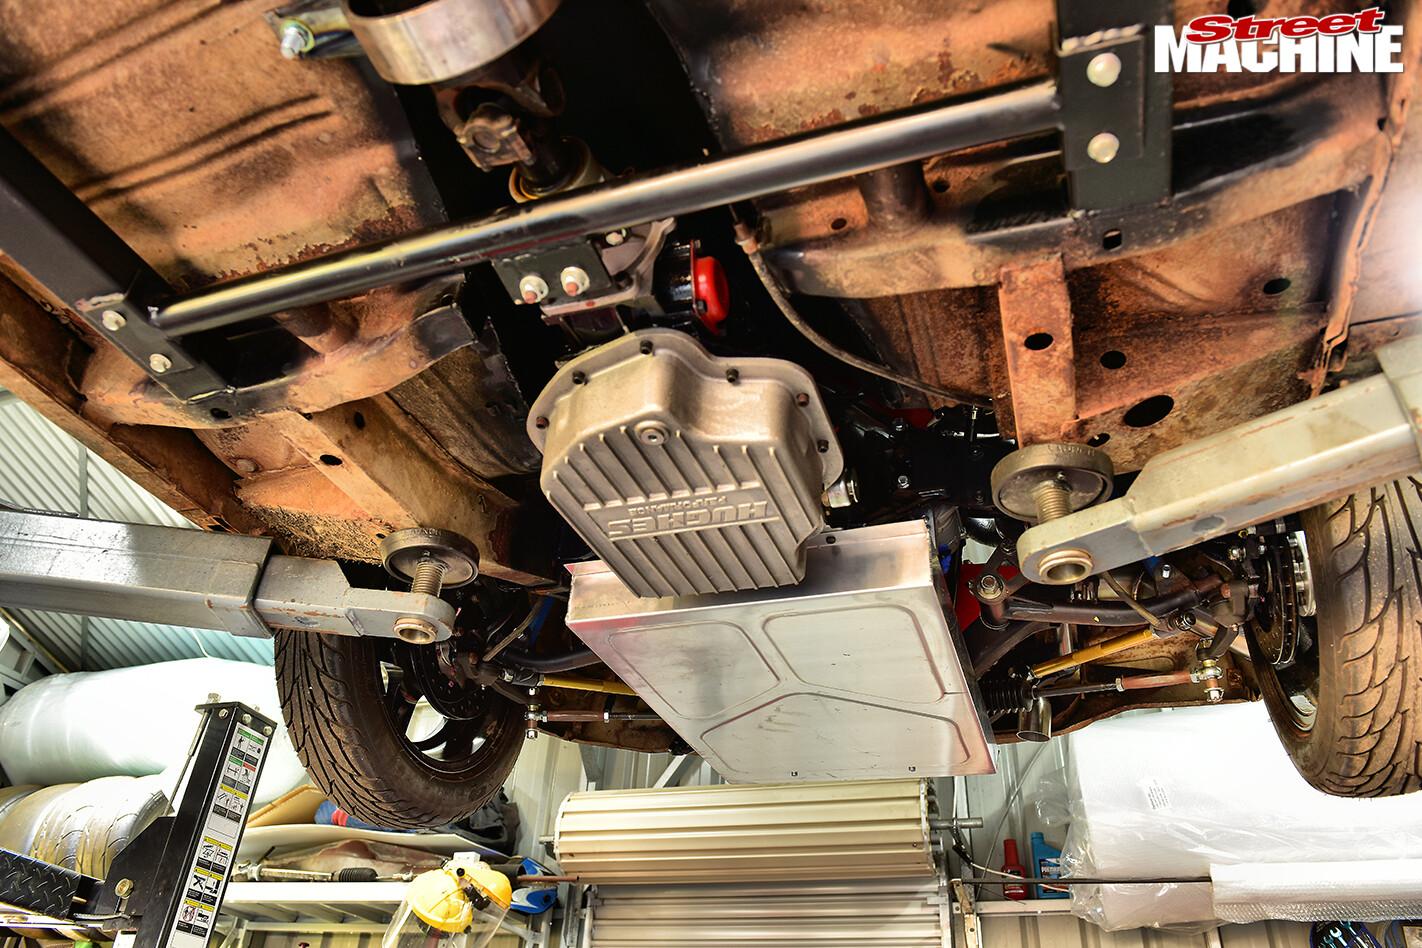 Street Machine Features Valiant Ap 6 Ute Underside 3